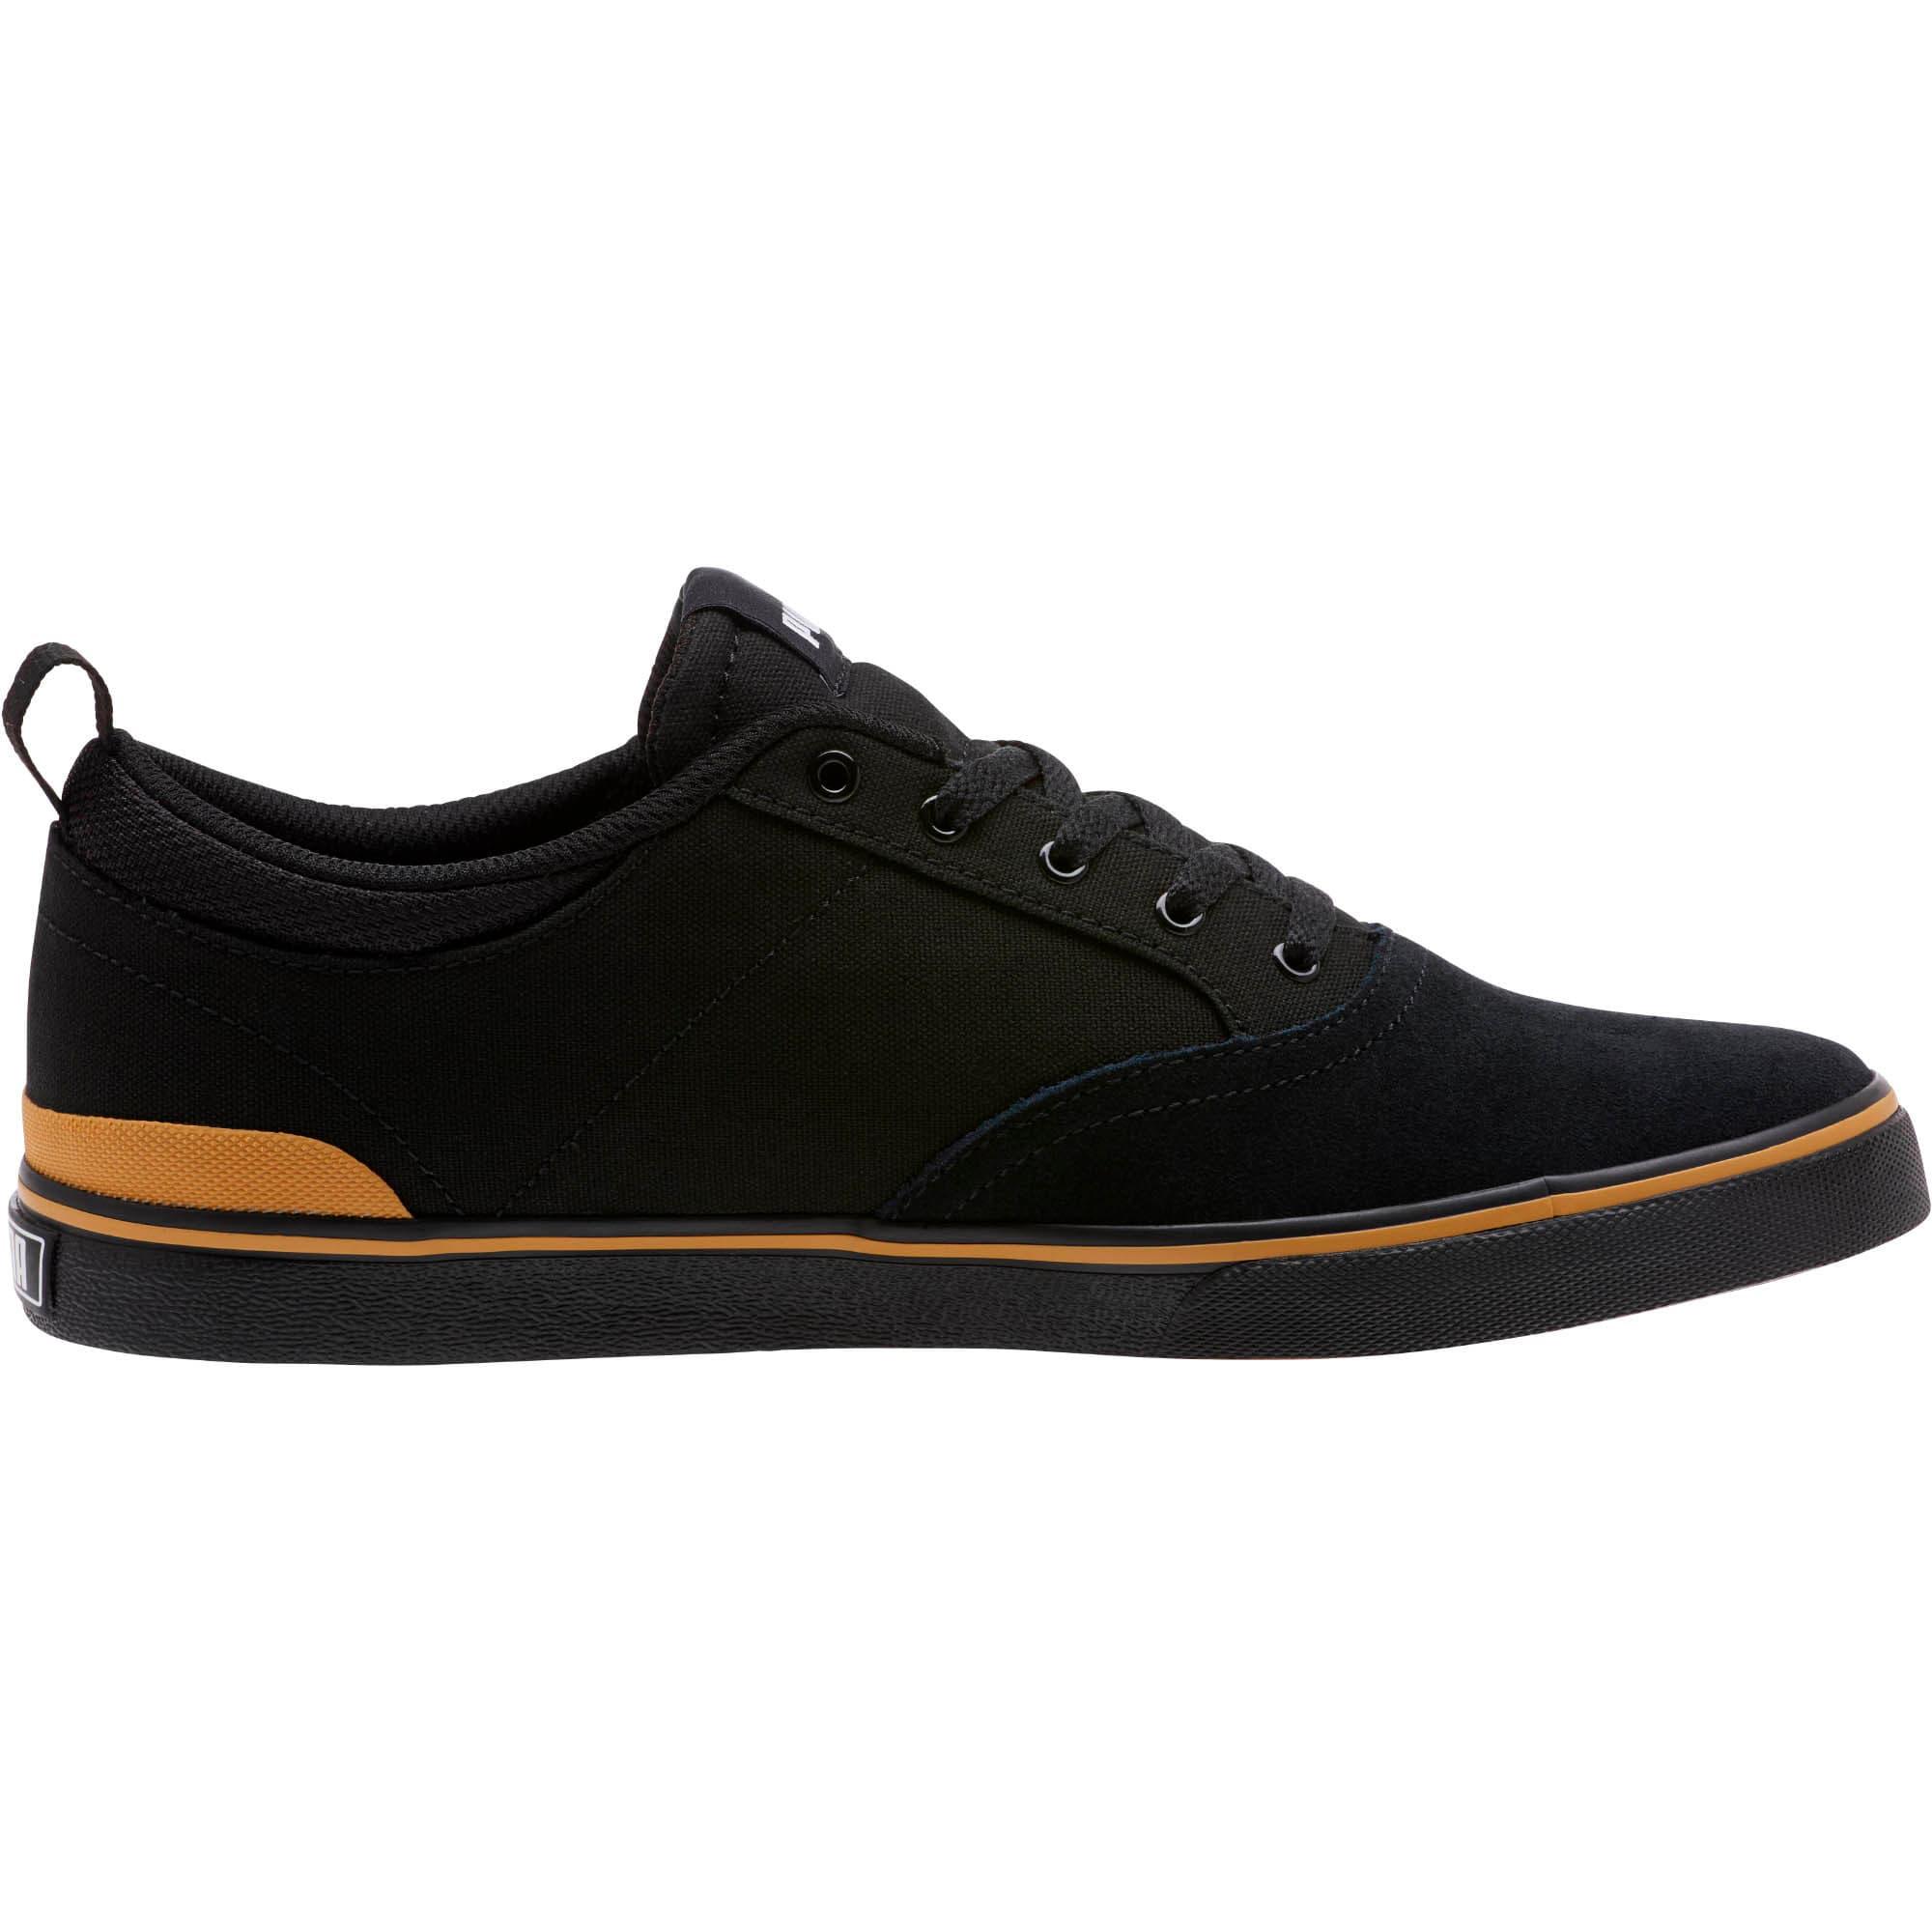 Thumbnail 3 of Puma Bridger Cat Men's Sneakers, Puma Black-Asphalt, medium